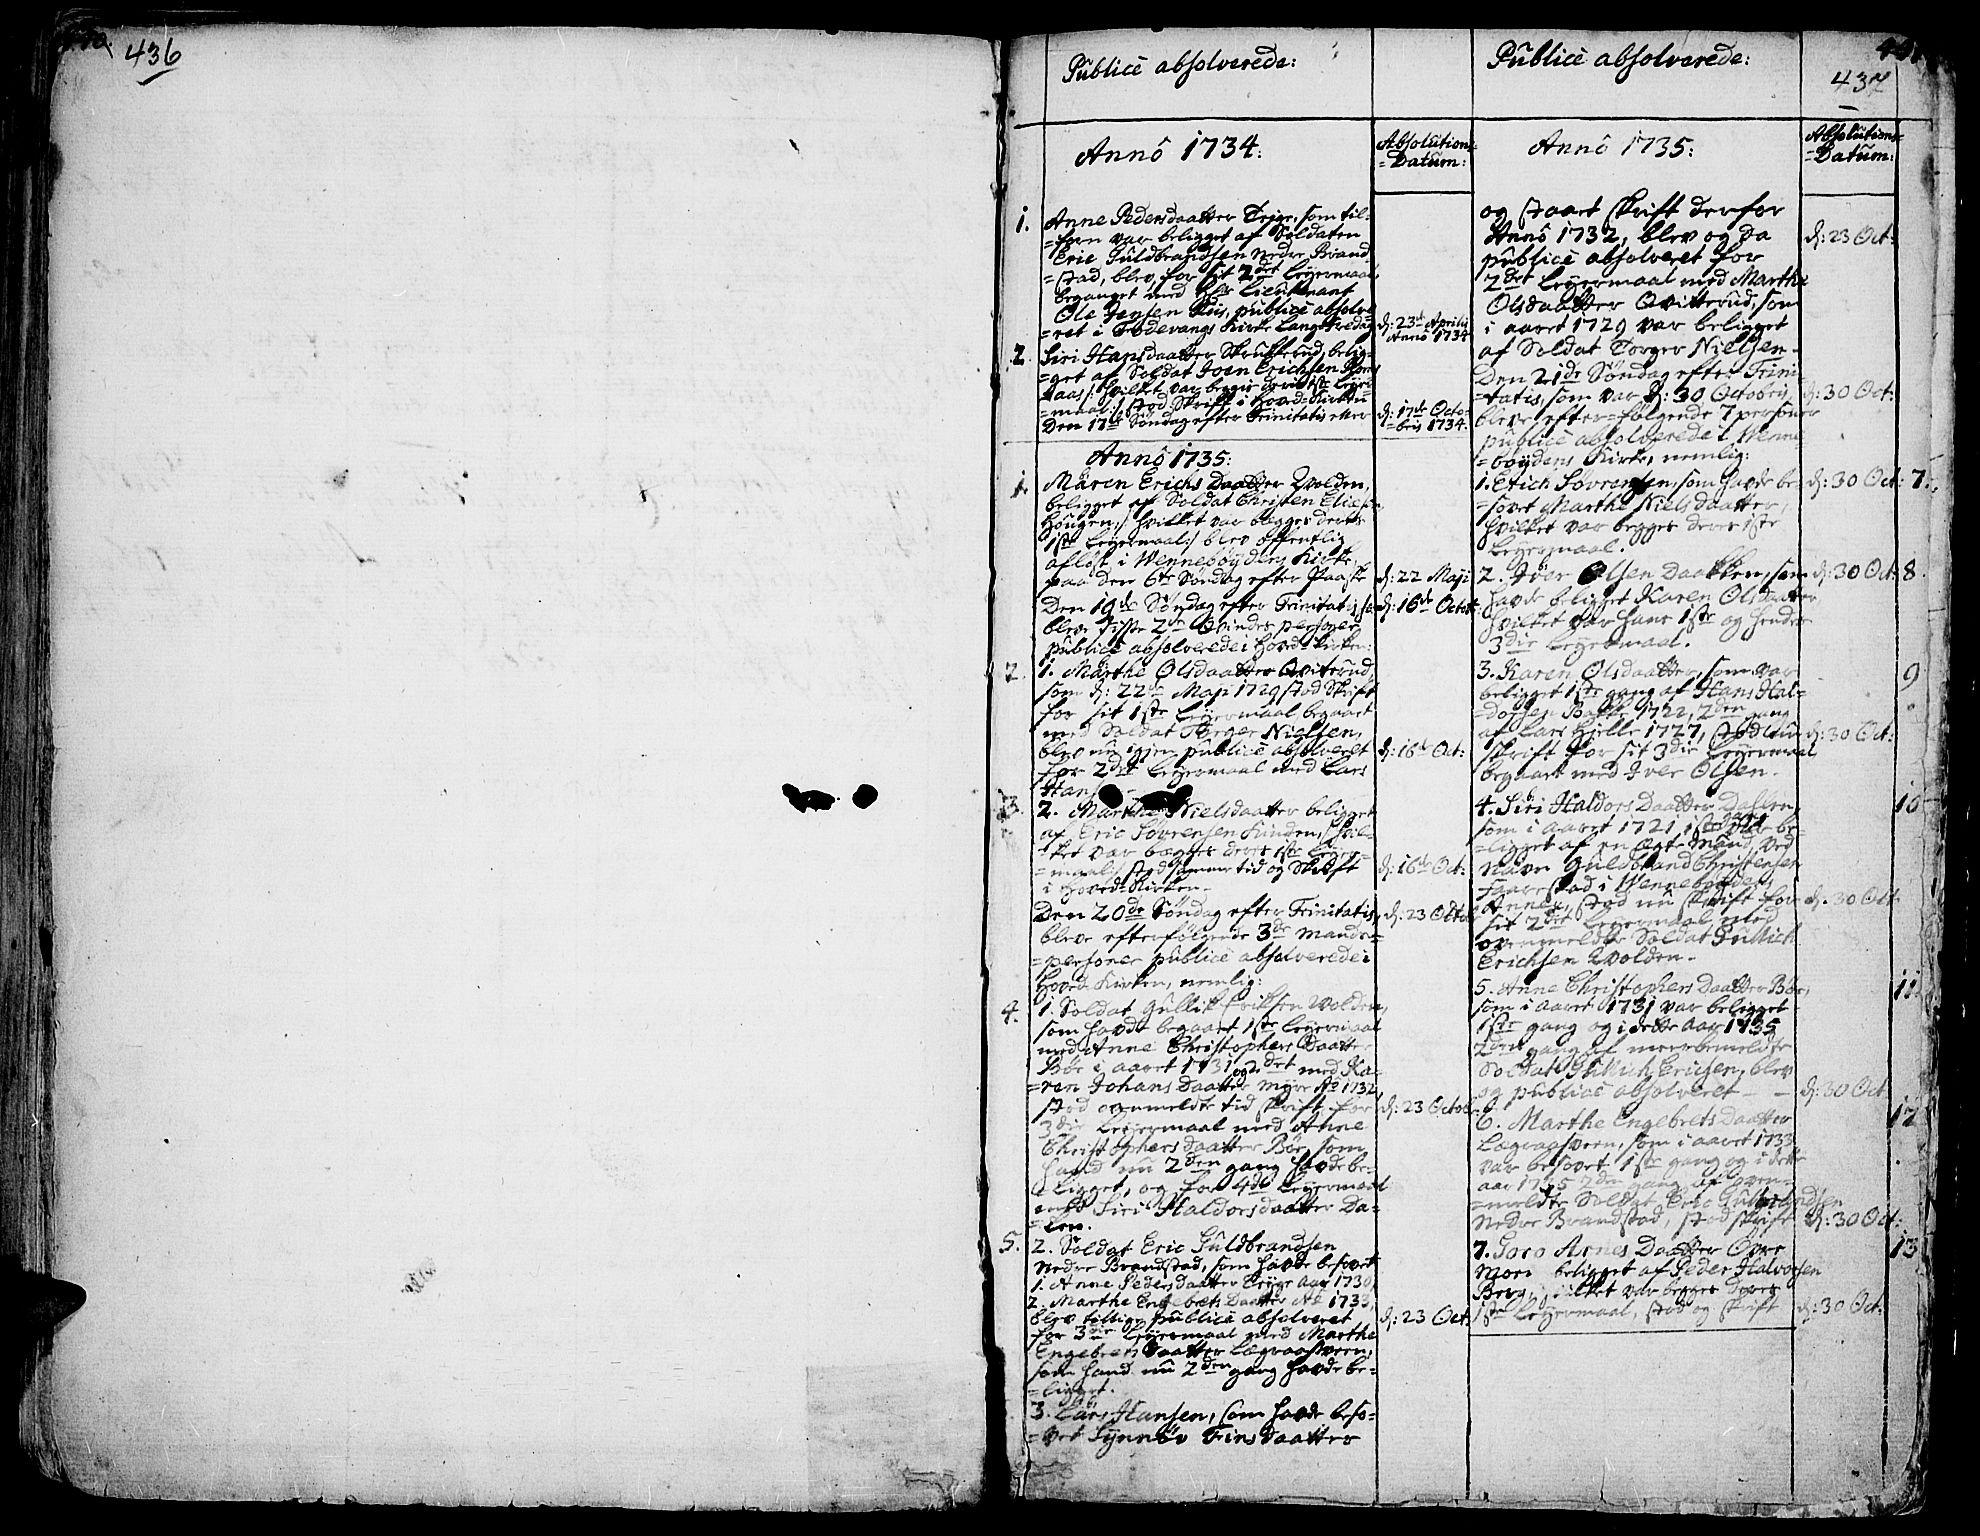 SAH, Ringebu prestekontor, Ministerialbok nr. 2, 1734-1780, s. 436-437